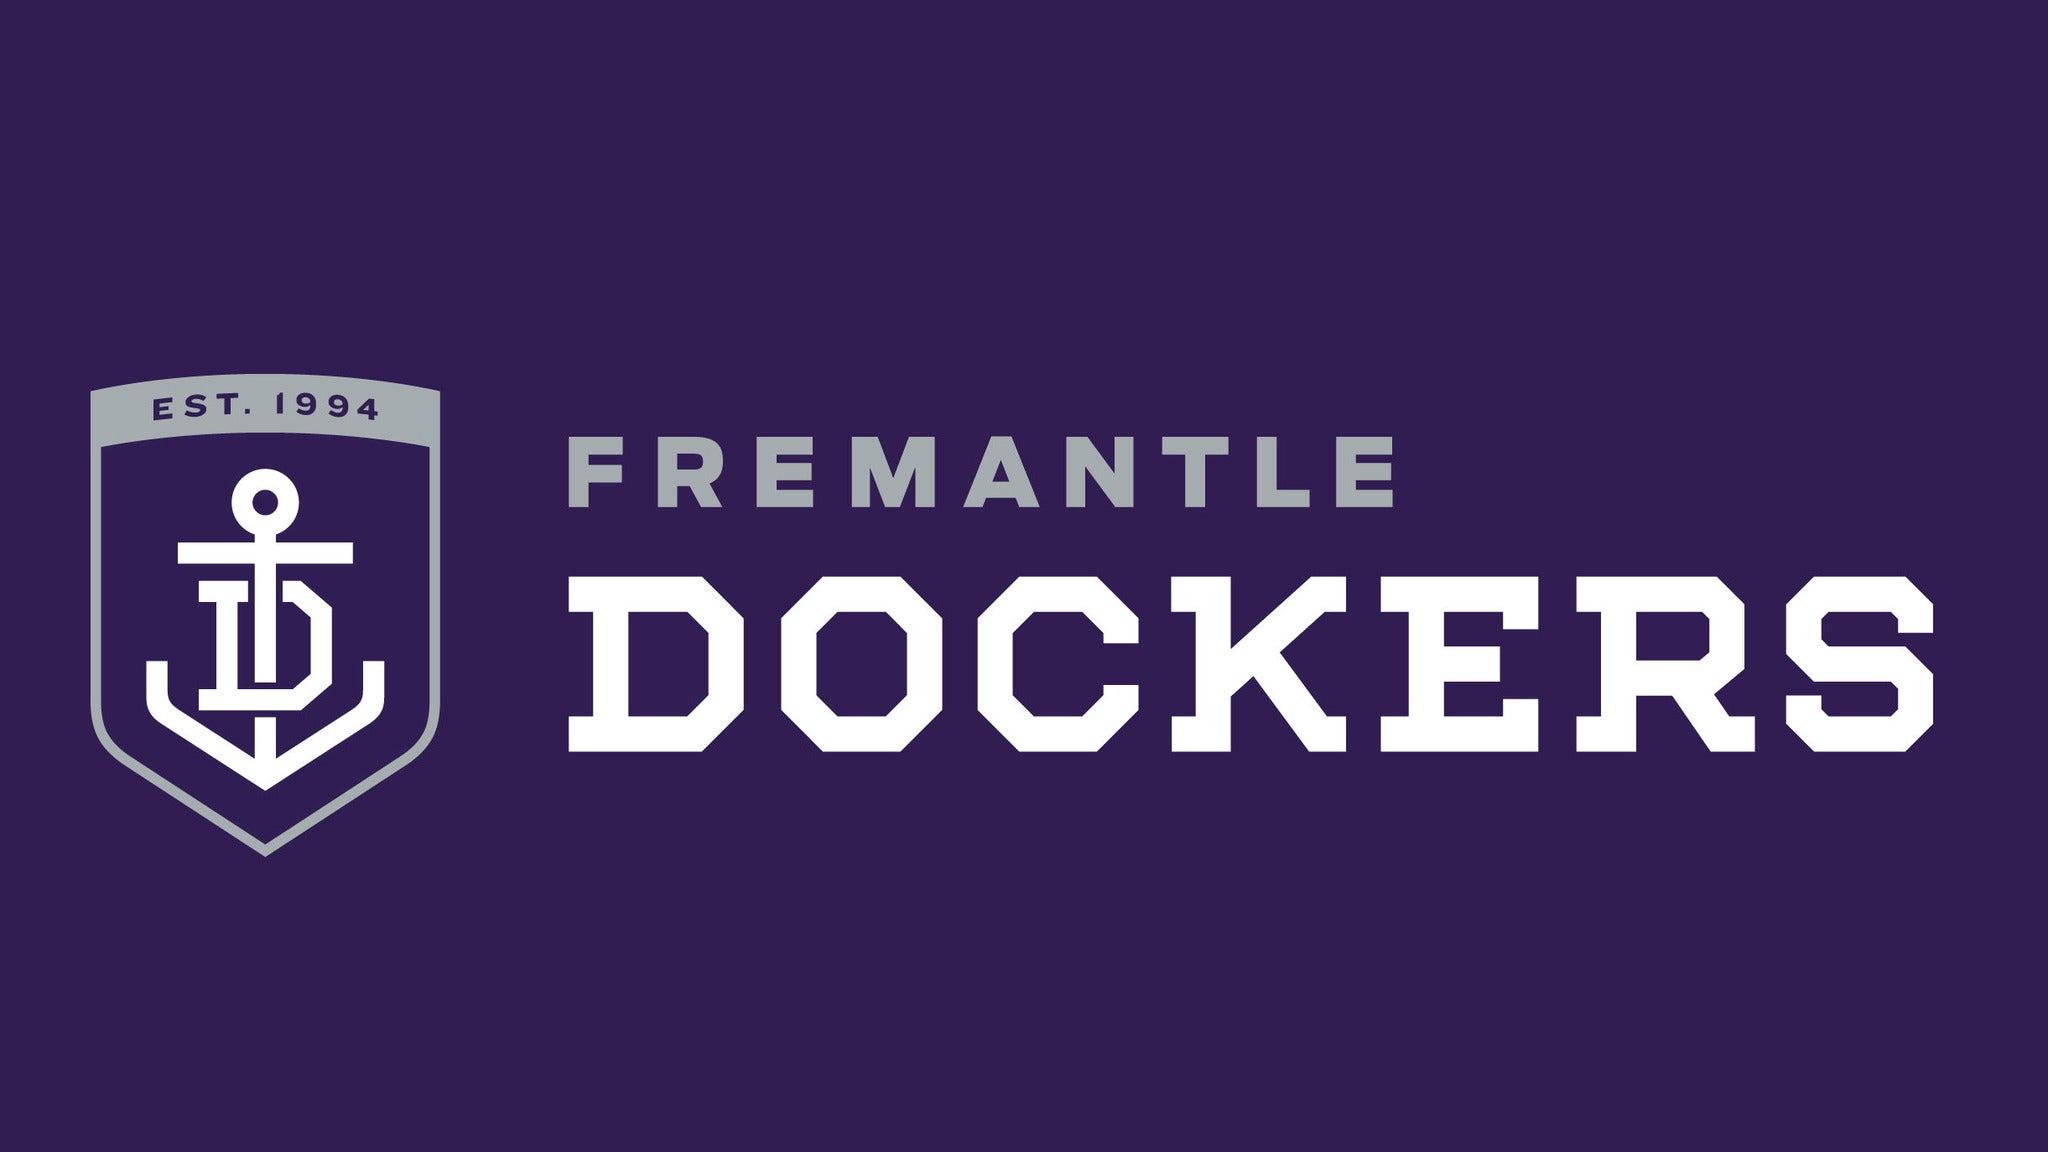 Fremantle Dockers v Essendon - Members